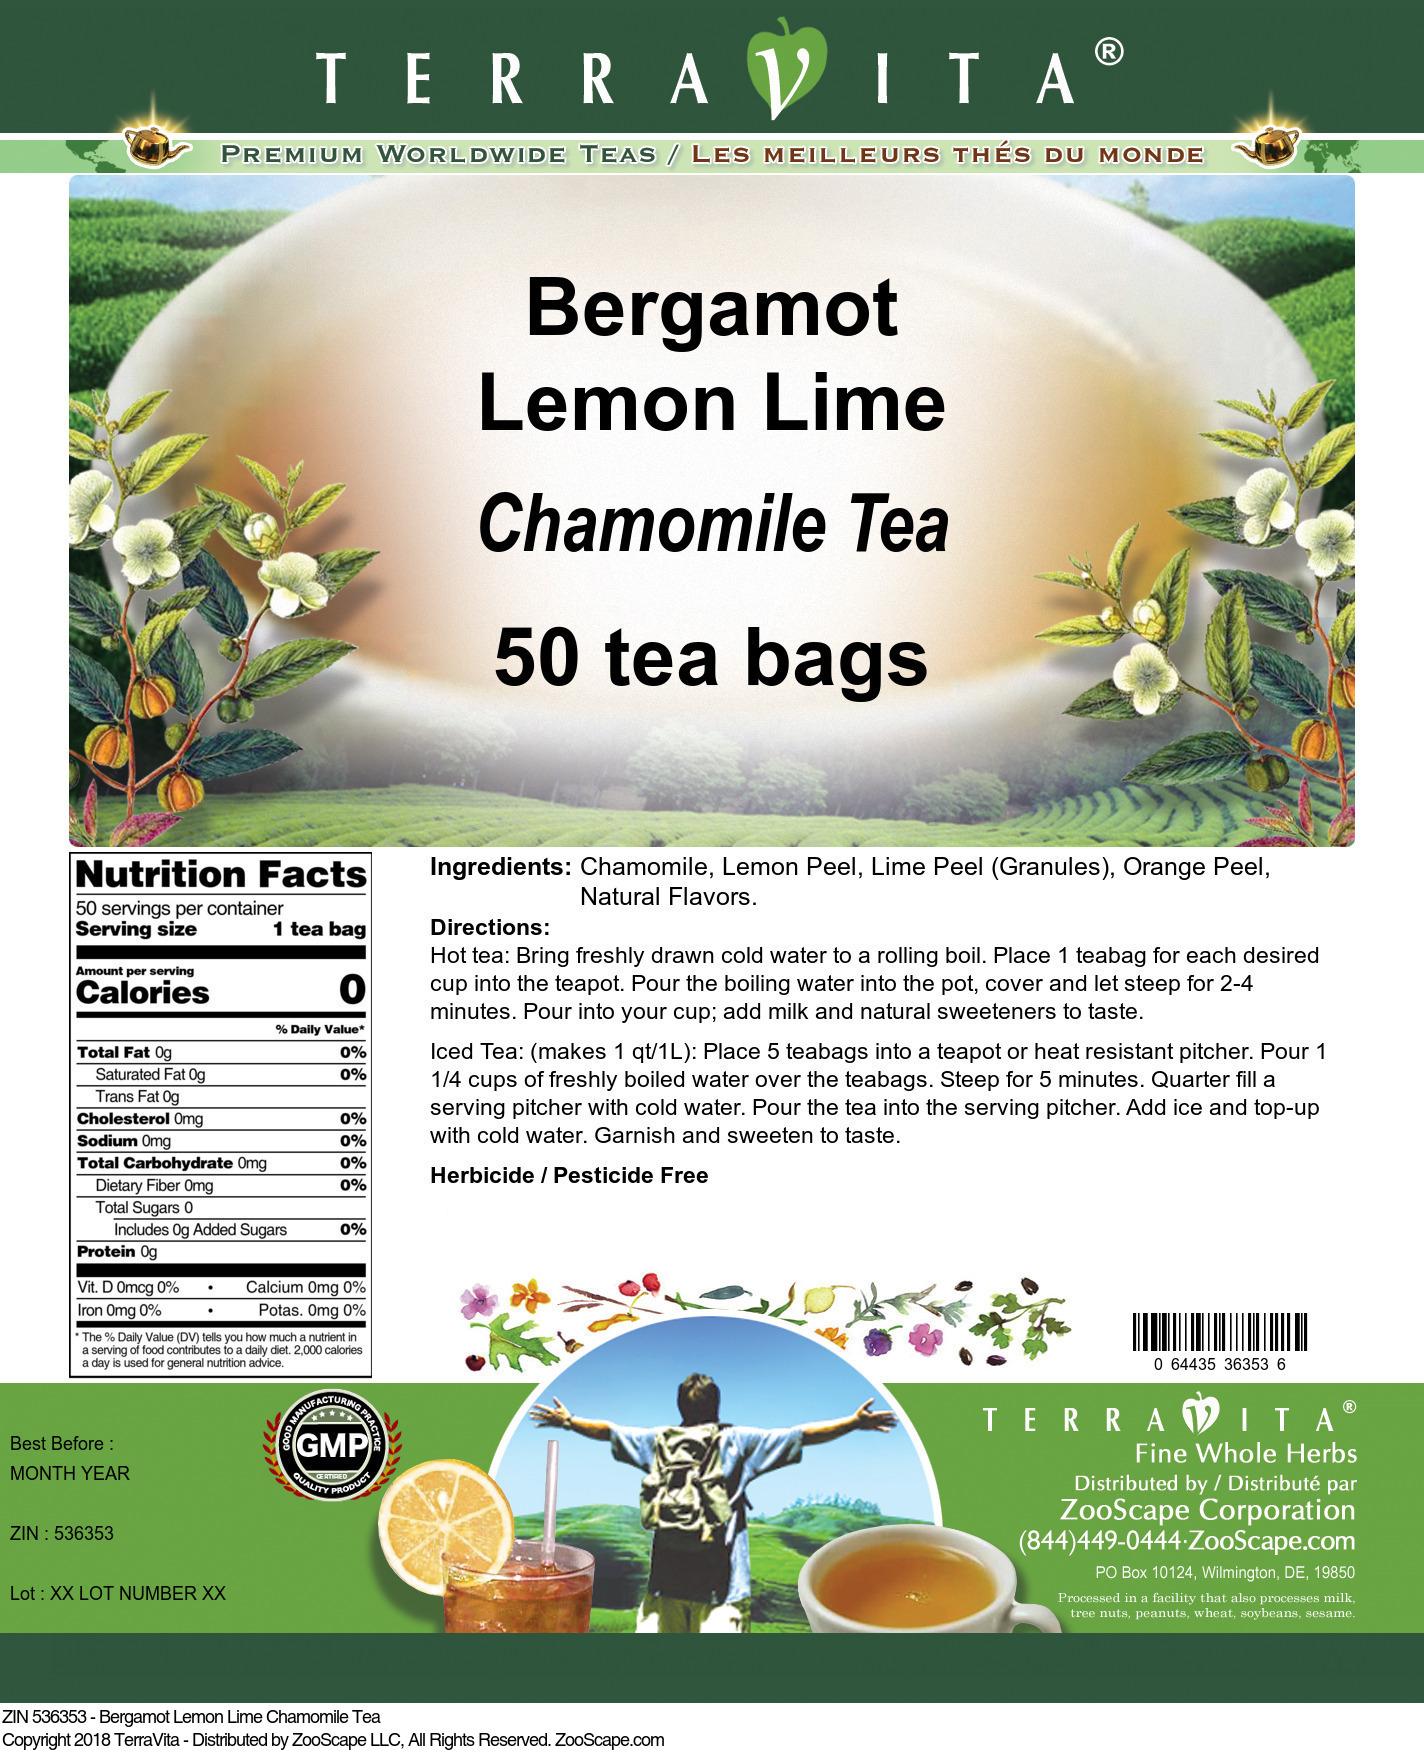 Bergamot Lemon Lime Chamomile Tea